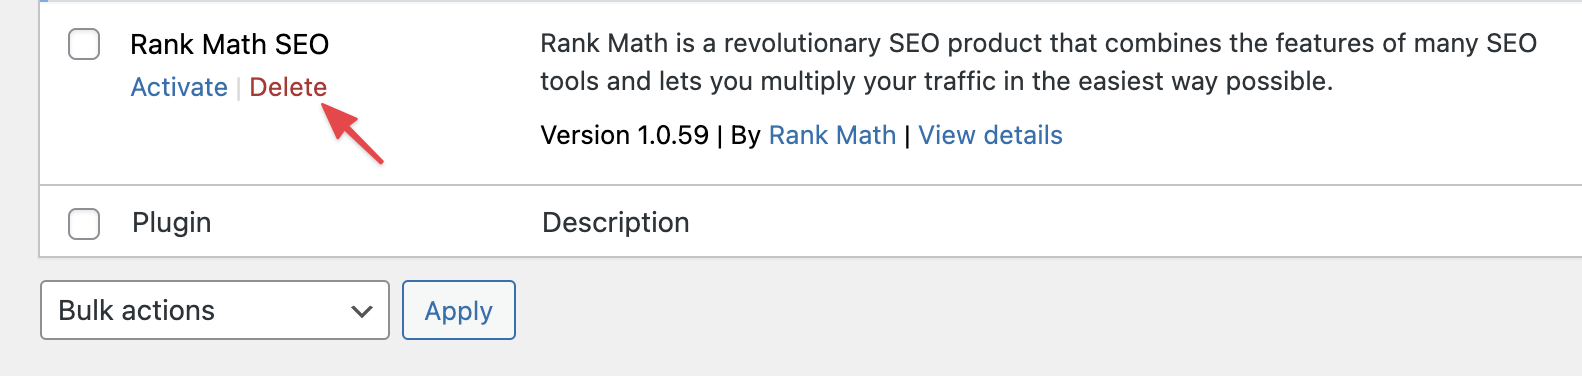 delete-rank-math